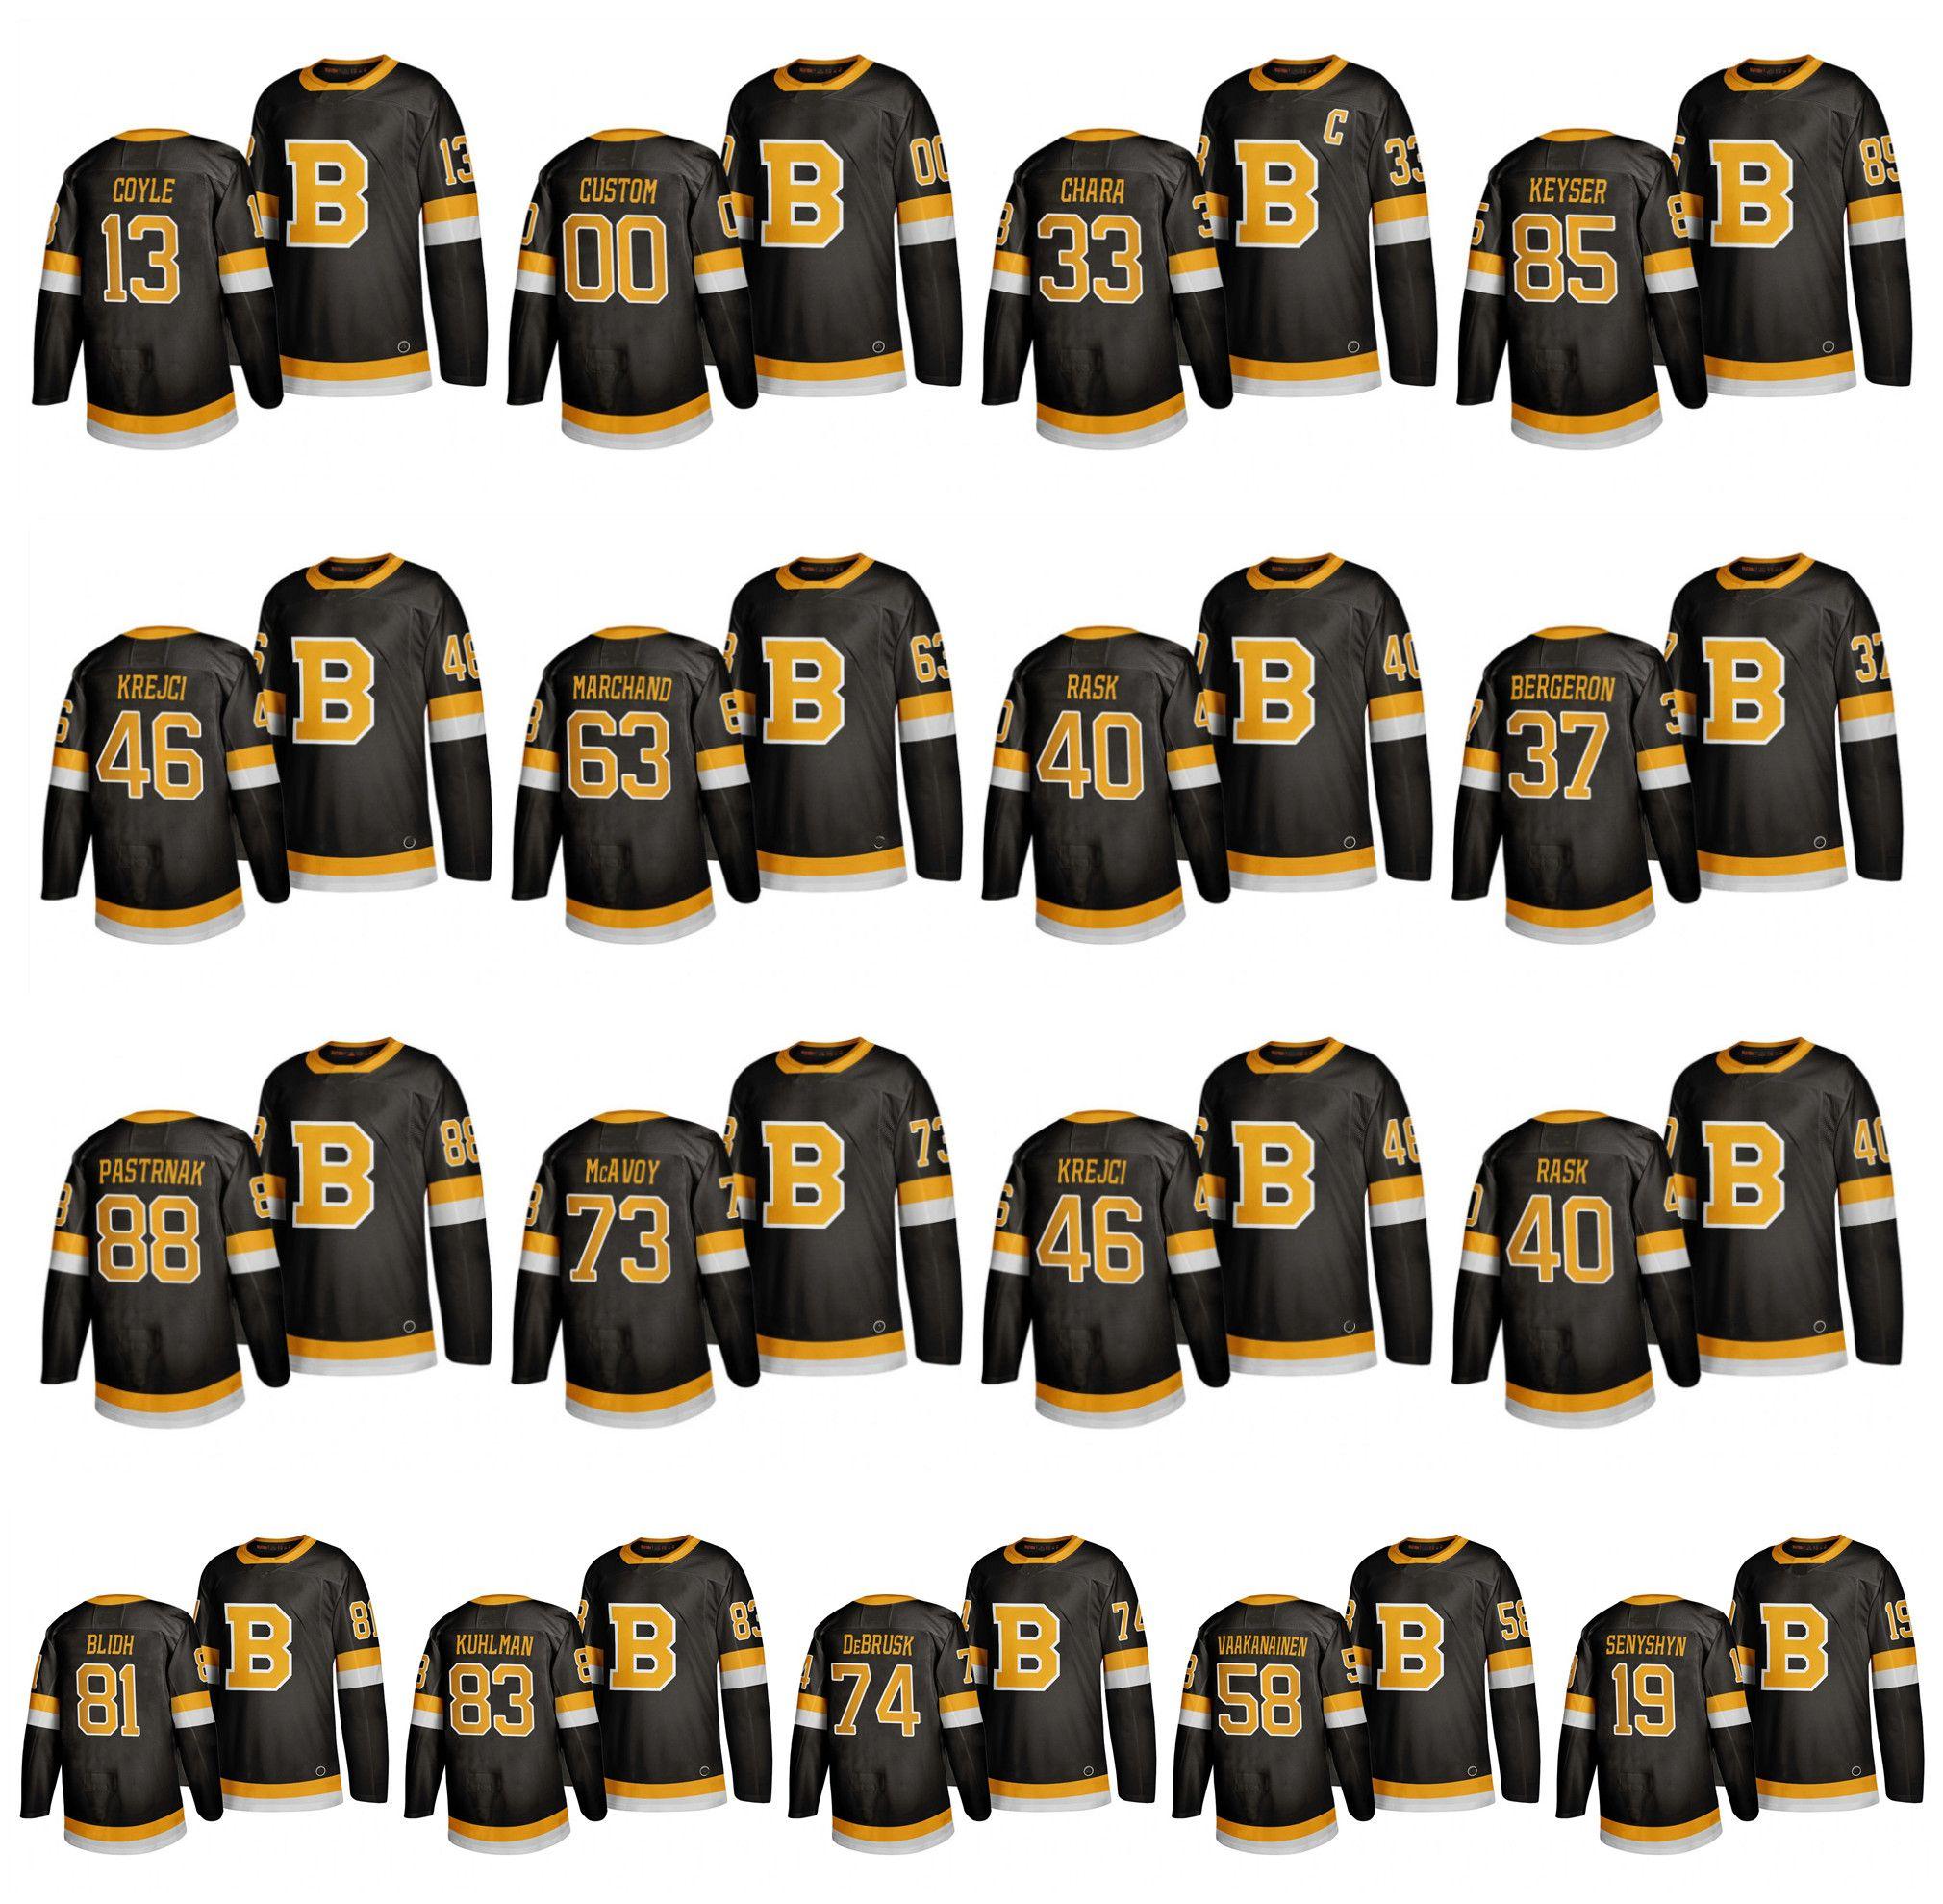 Terceira camisa do Boston Bruins 33 Zdeno Chara 37 Bergeron Torey Krug 63 Brad Marchand 86 Kevan Miller 88 David Pastrnak 40 Tuukka Rask Hockey